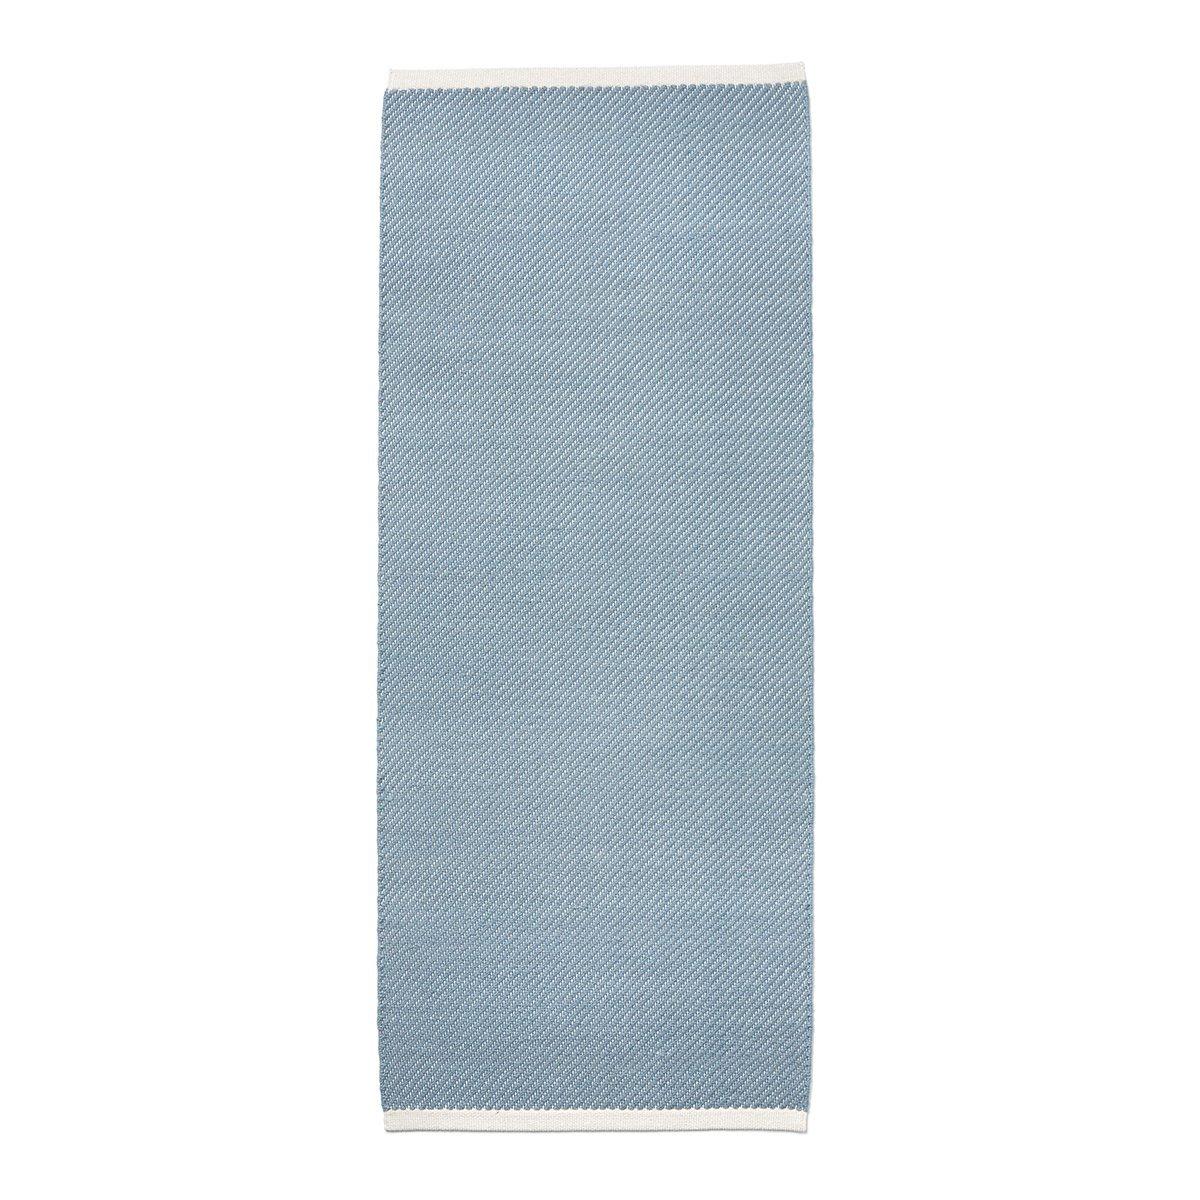 HAY Bias Vloerkleed - Light Blue - 80 x 200 cm.